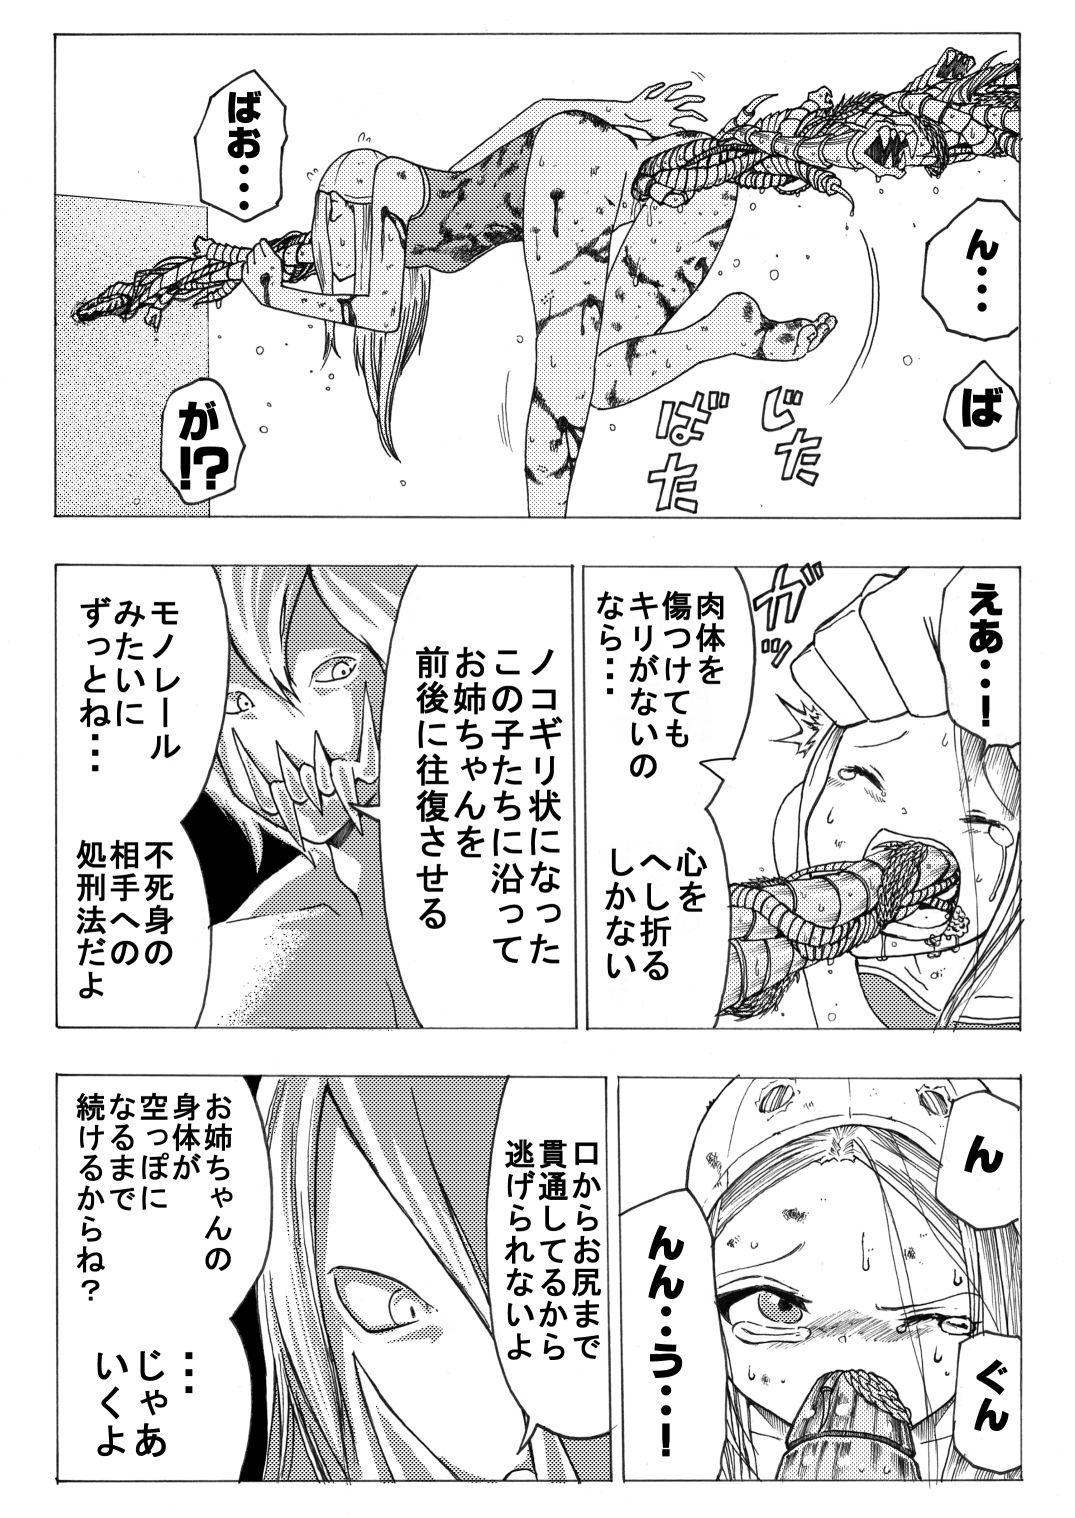 Sukumizu Senshi Ryona Manga 2-kan 27